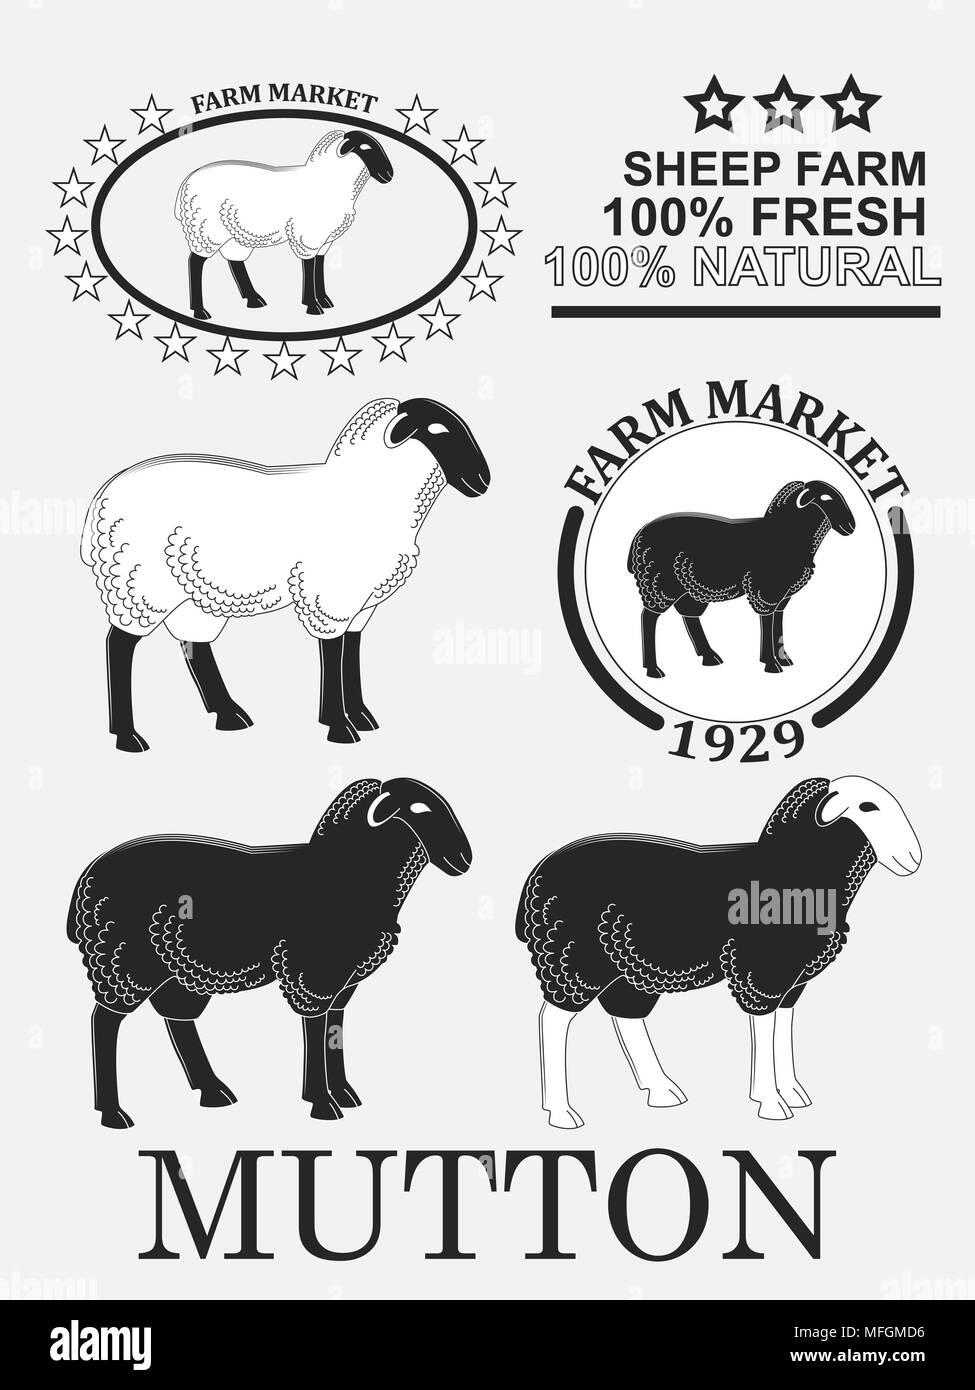 Lamb Head Black And White Stock S Alamy